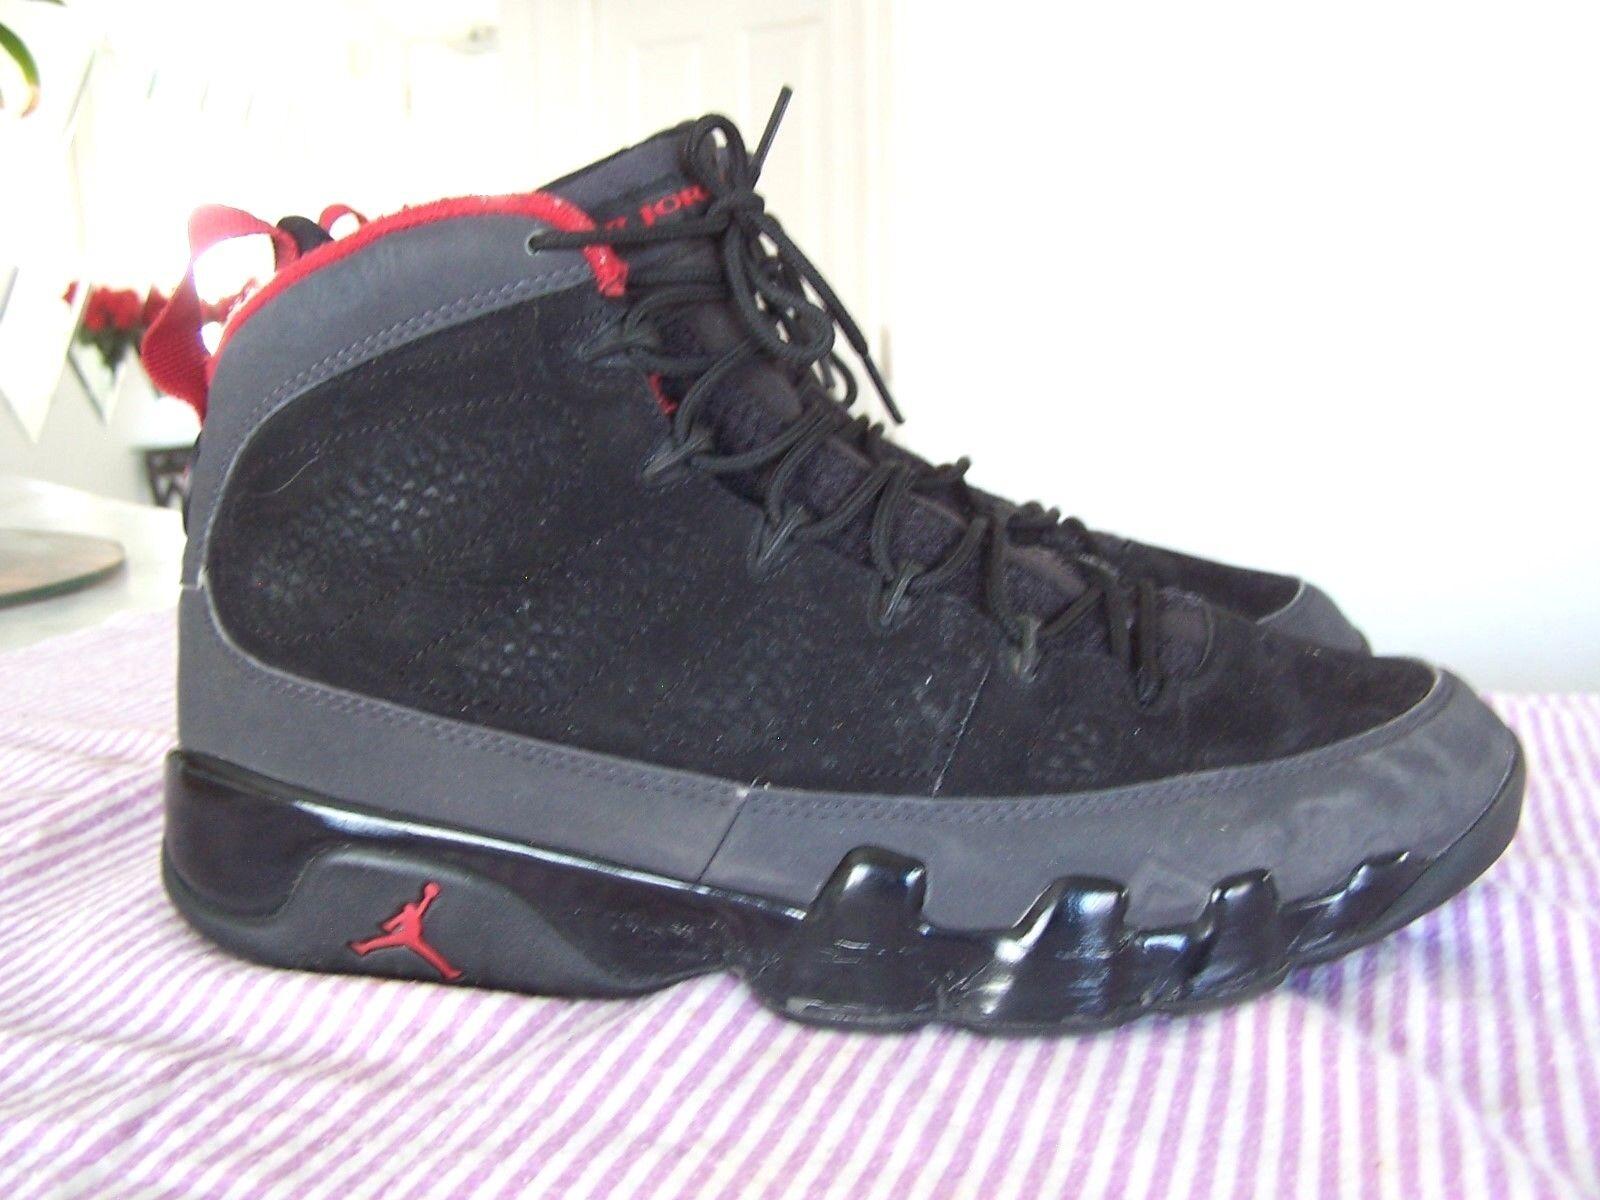 AIR JORDAN 23 Mens Black Retro 302370-005 Charcoal Shoes Size 10 (2010)